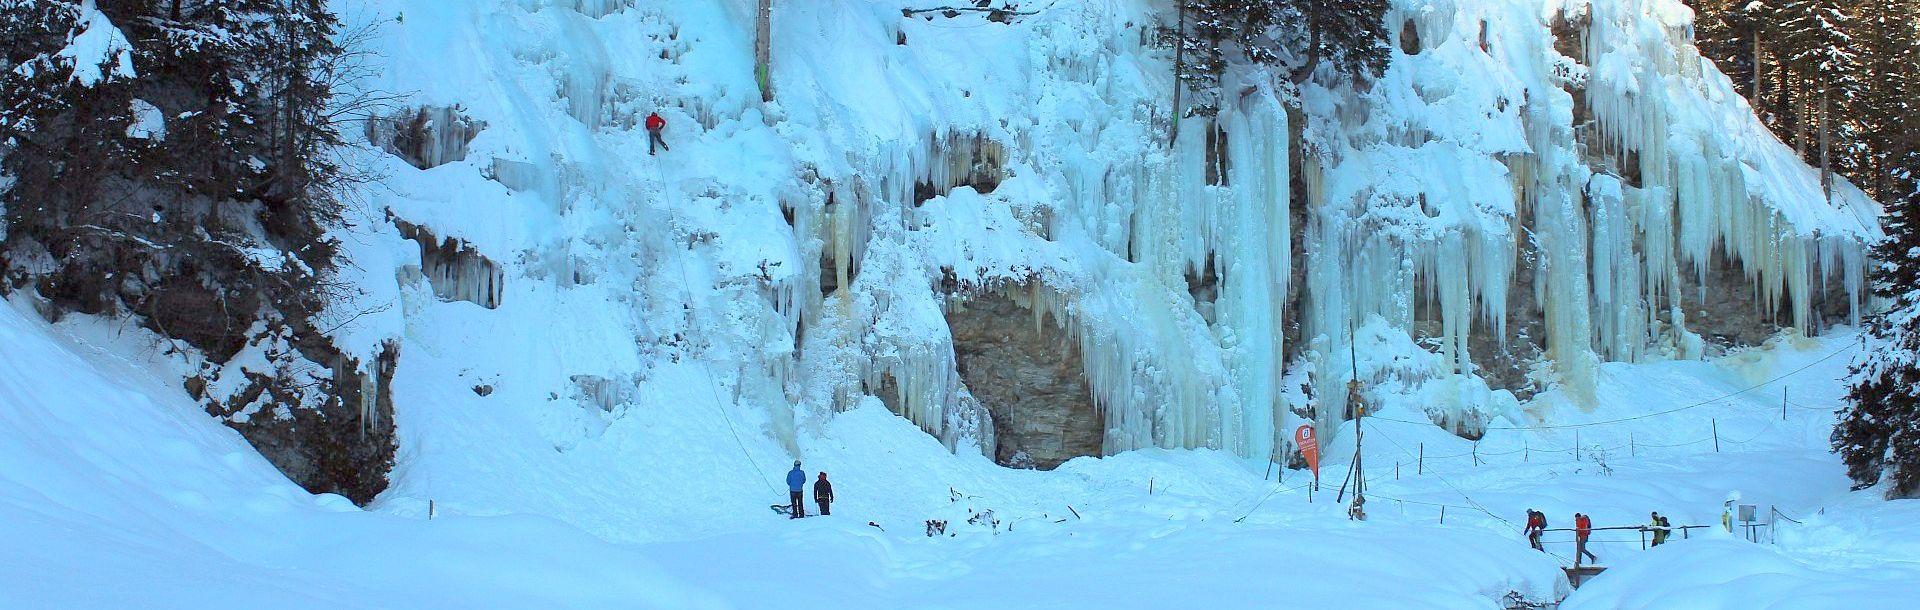 Eisklettern in Osttirol | Bild foto-webcam.eu